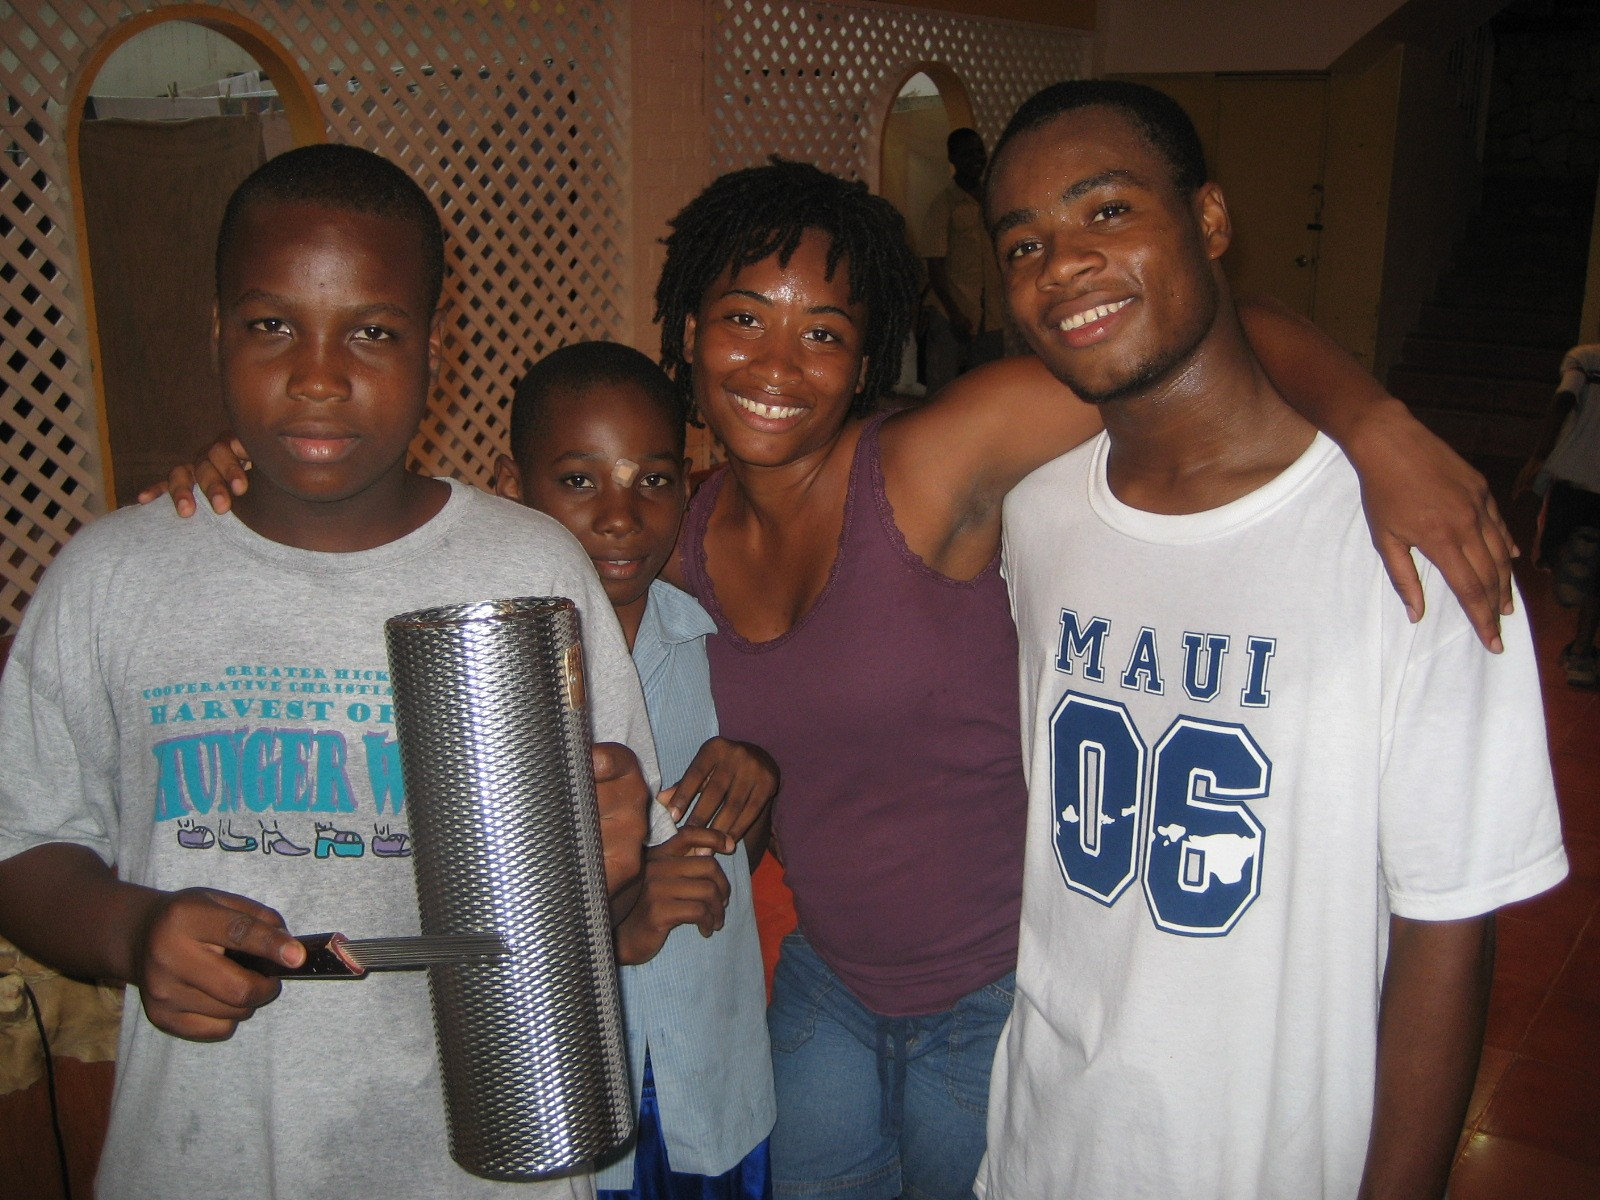 2007. Haiti, TWA, Third World Awareness, charity, non-profit, helping, volunteering, friends, Haitian boys, kids, love, friends